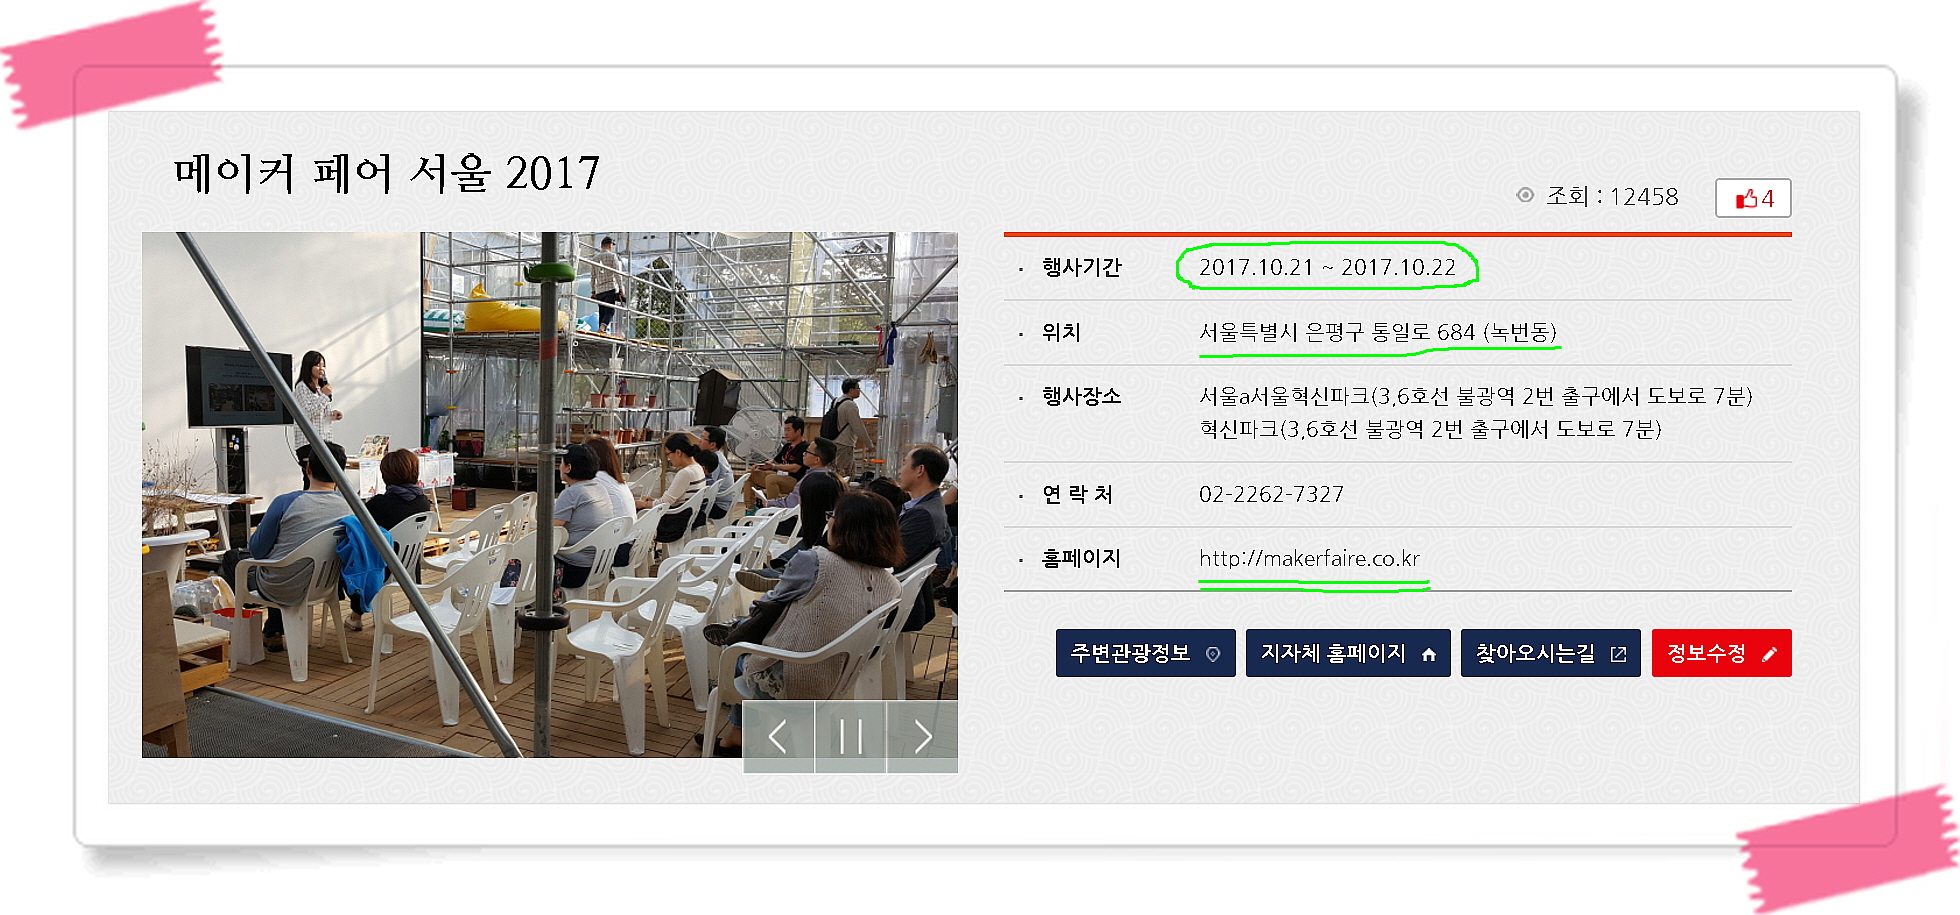 mb-file.php?path=2017%2F10%2F21%2FF563_makerfaire_seoul.jpg